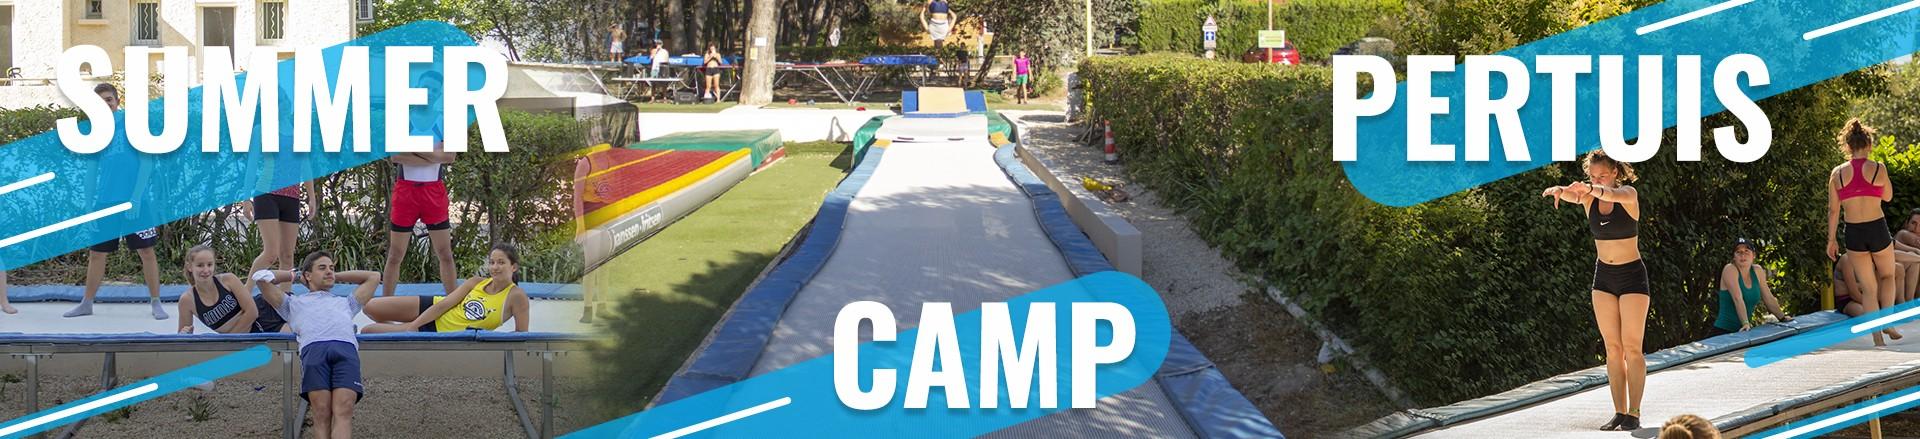 la fast Track du Summer Camp Pertuis